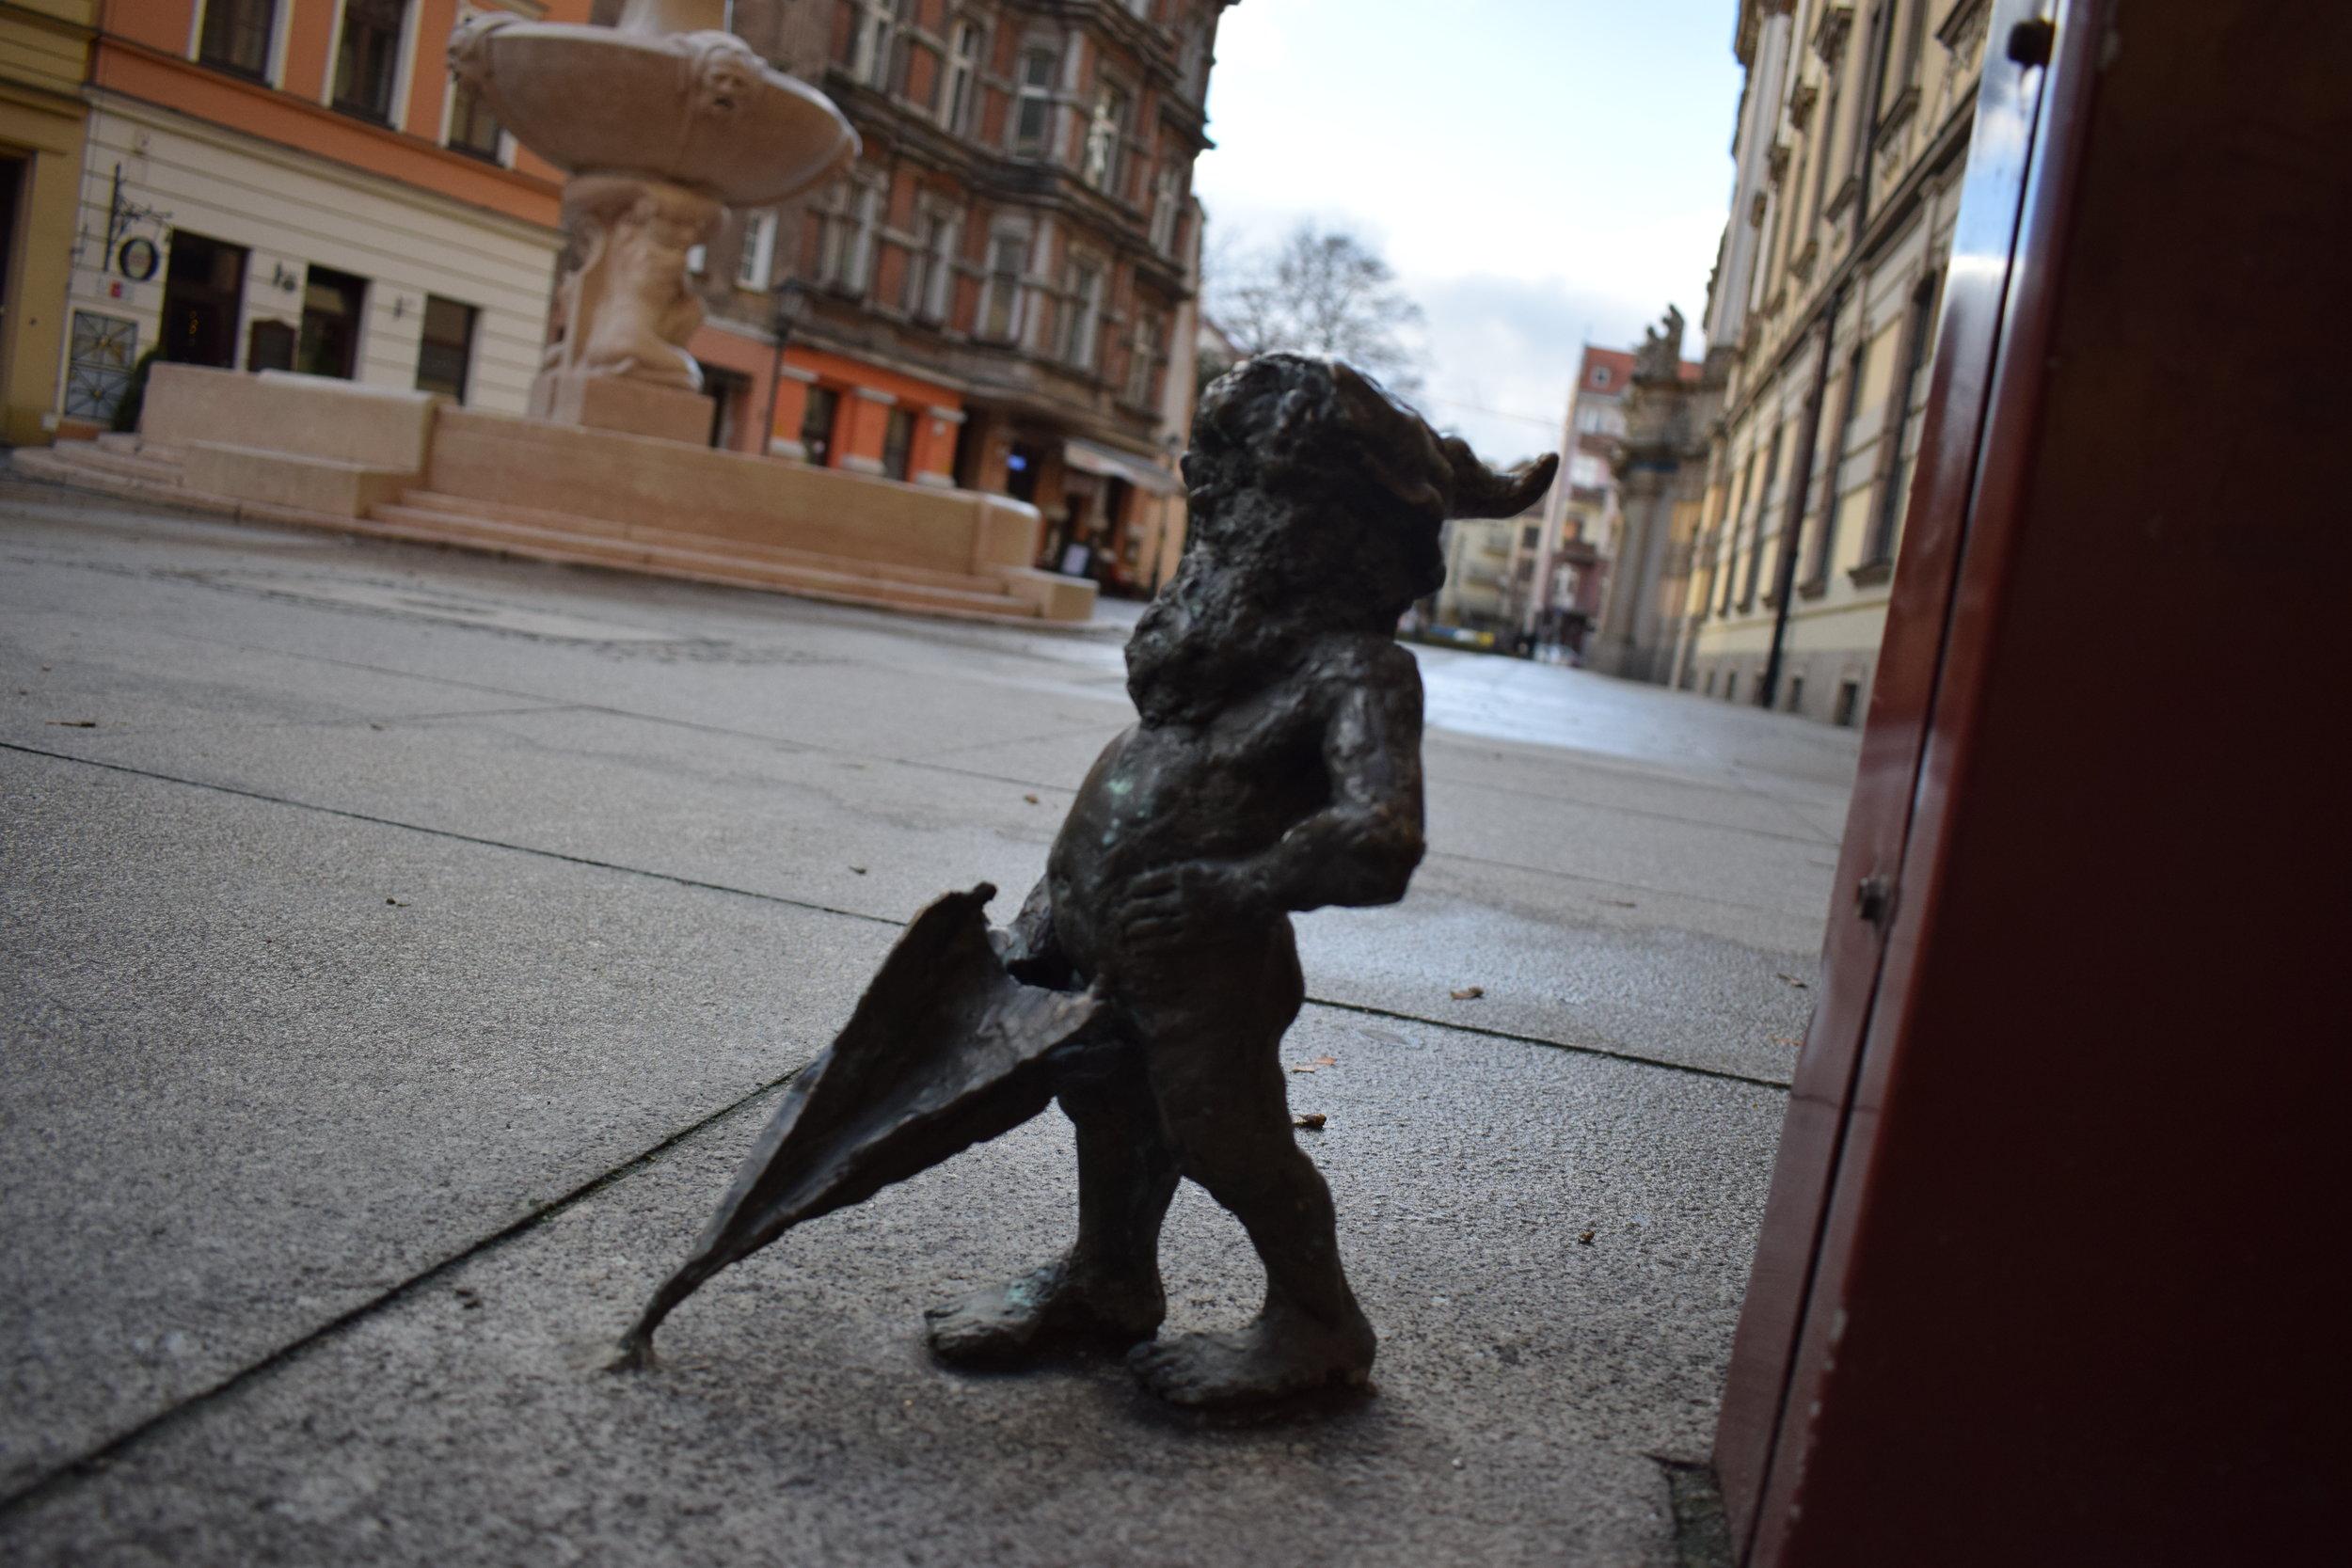 The dwarfs can be found all over  Wrocław  .